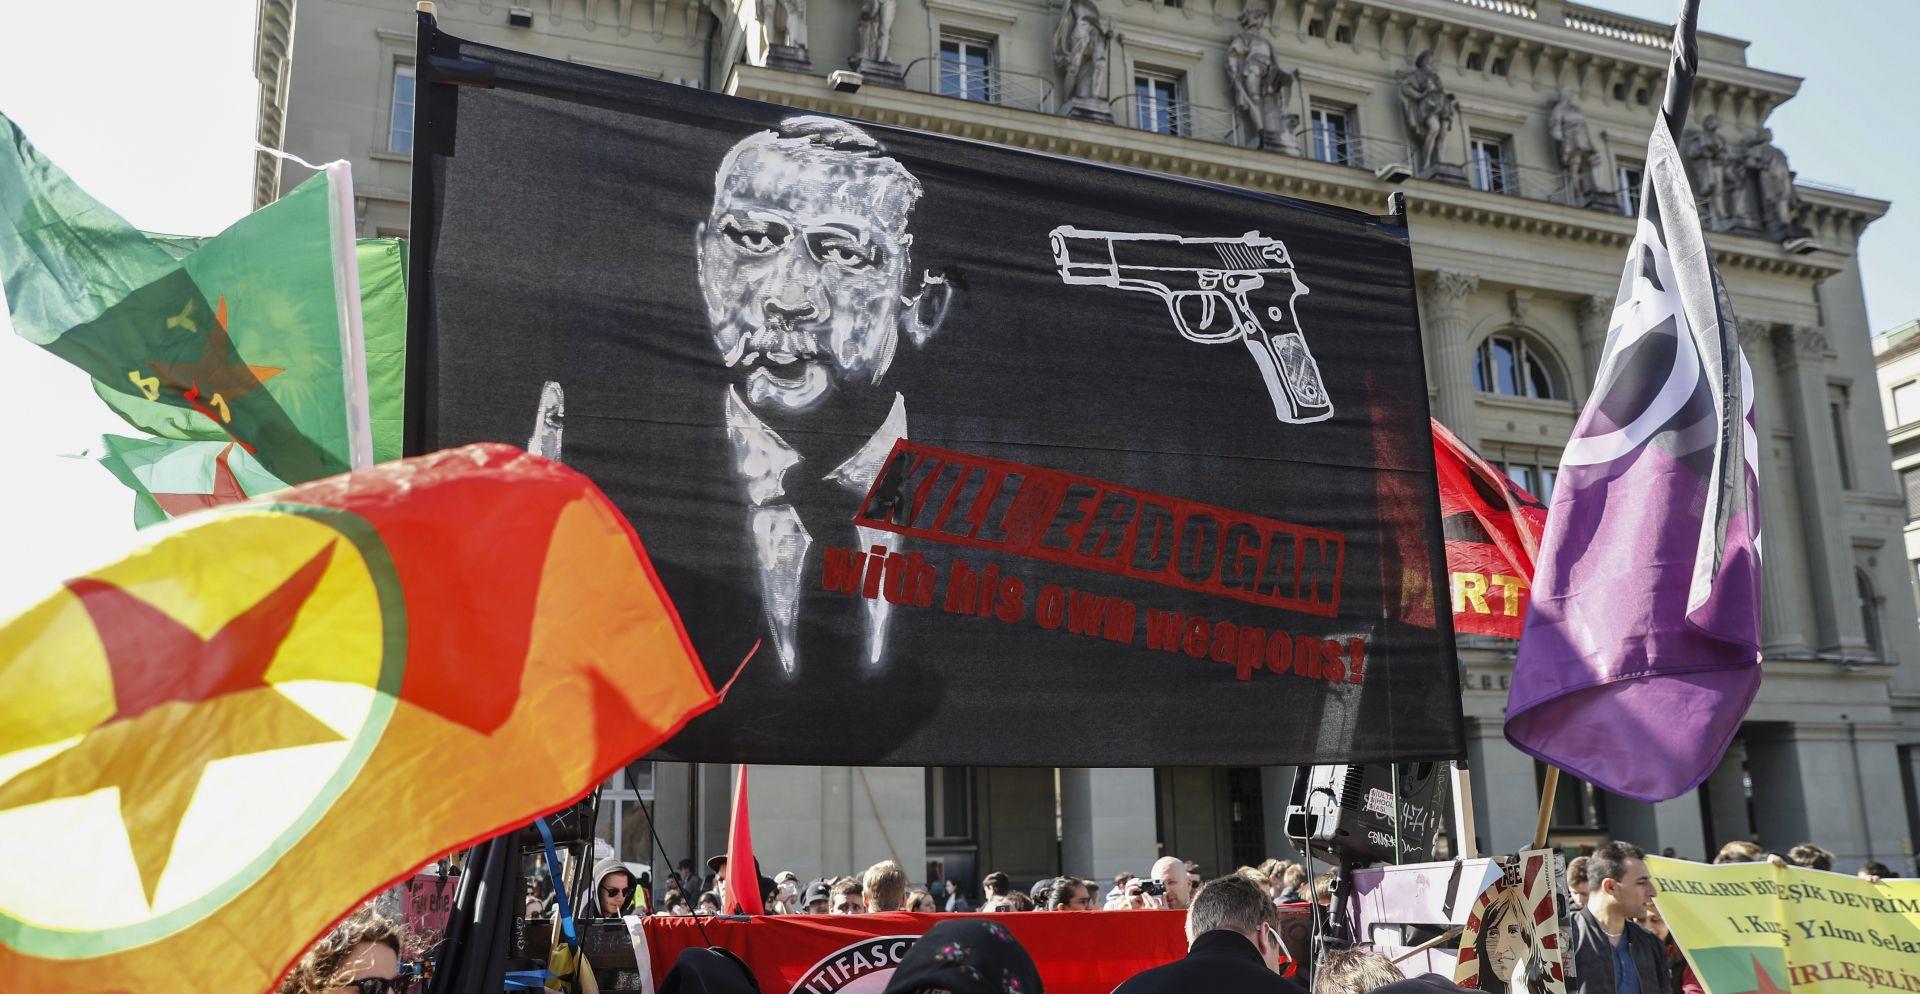 Turska pozvala švicarskog otpravnika poslova zbog skupa u Bernu